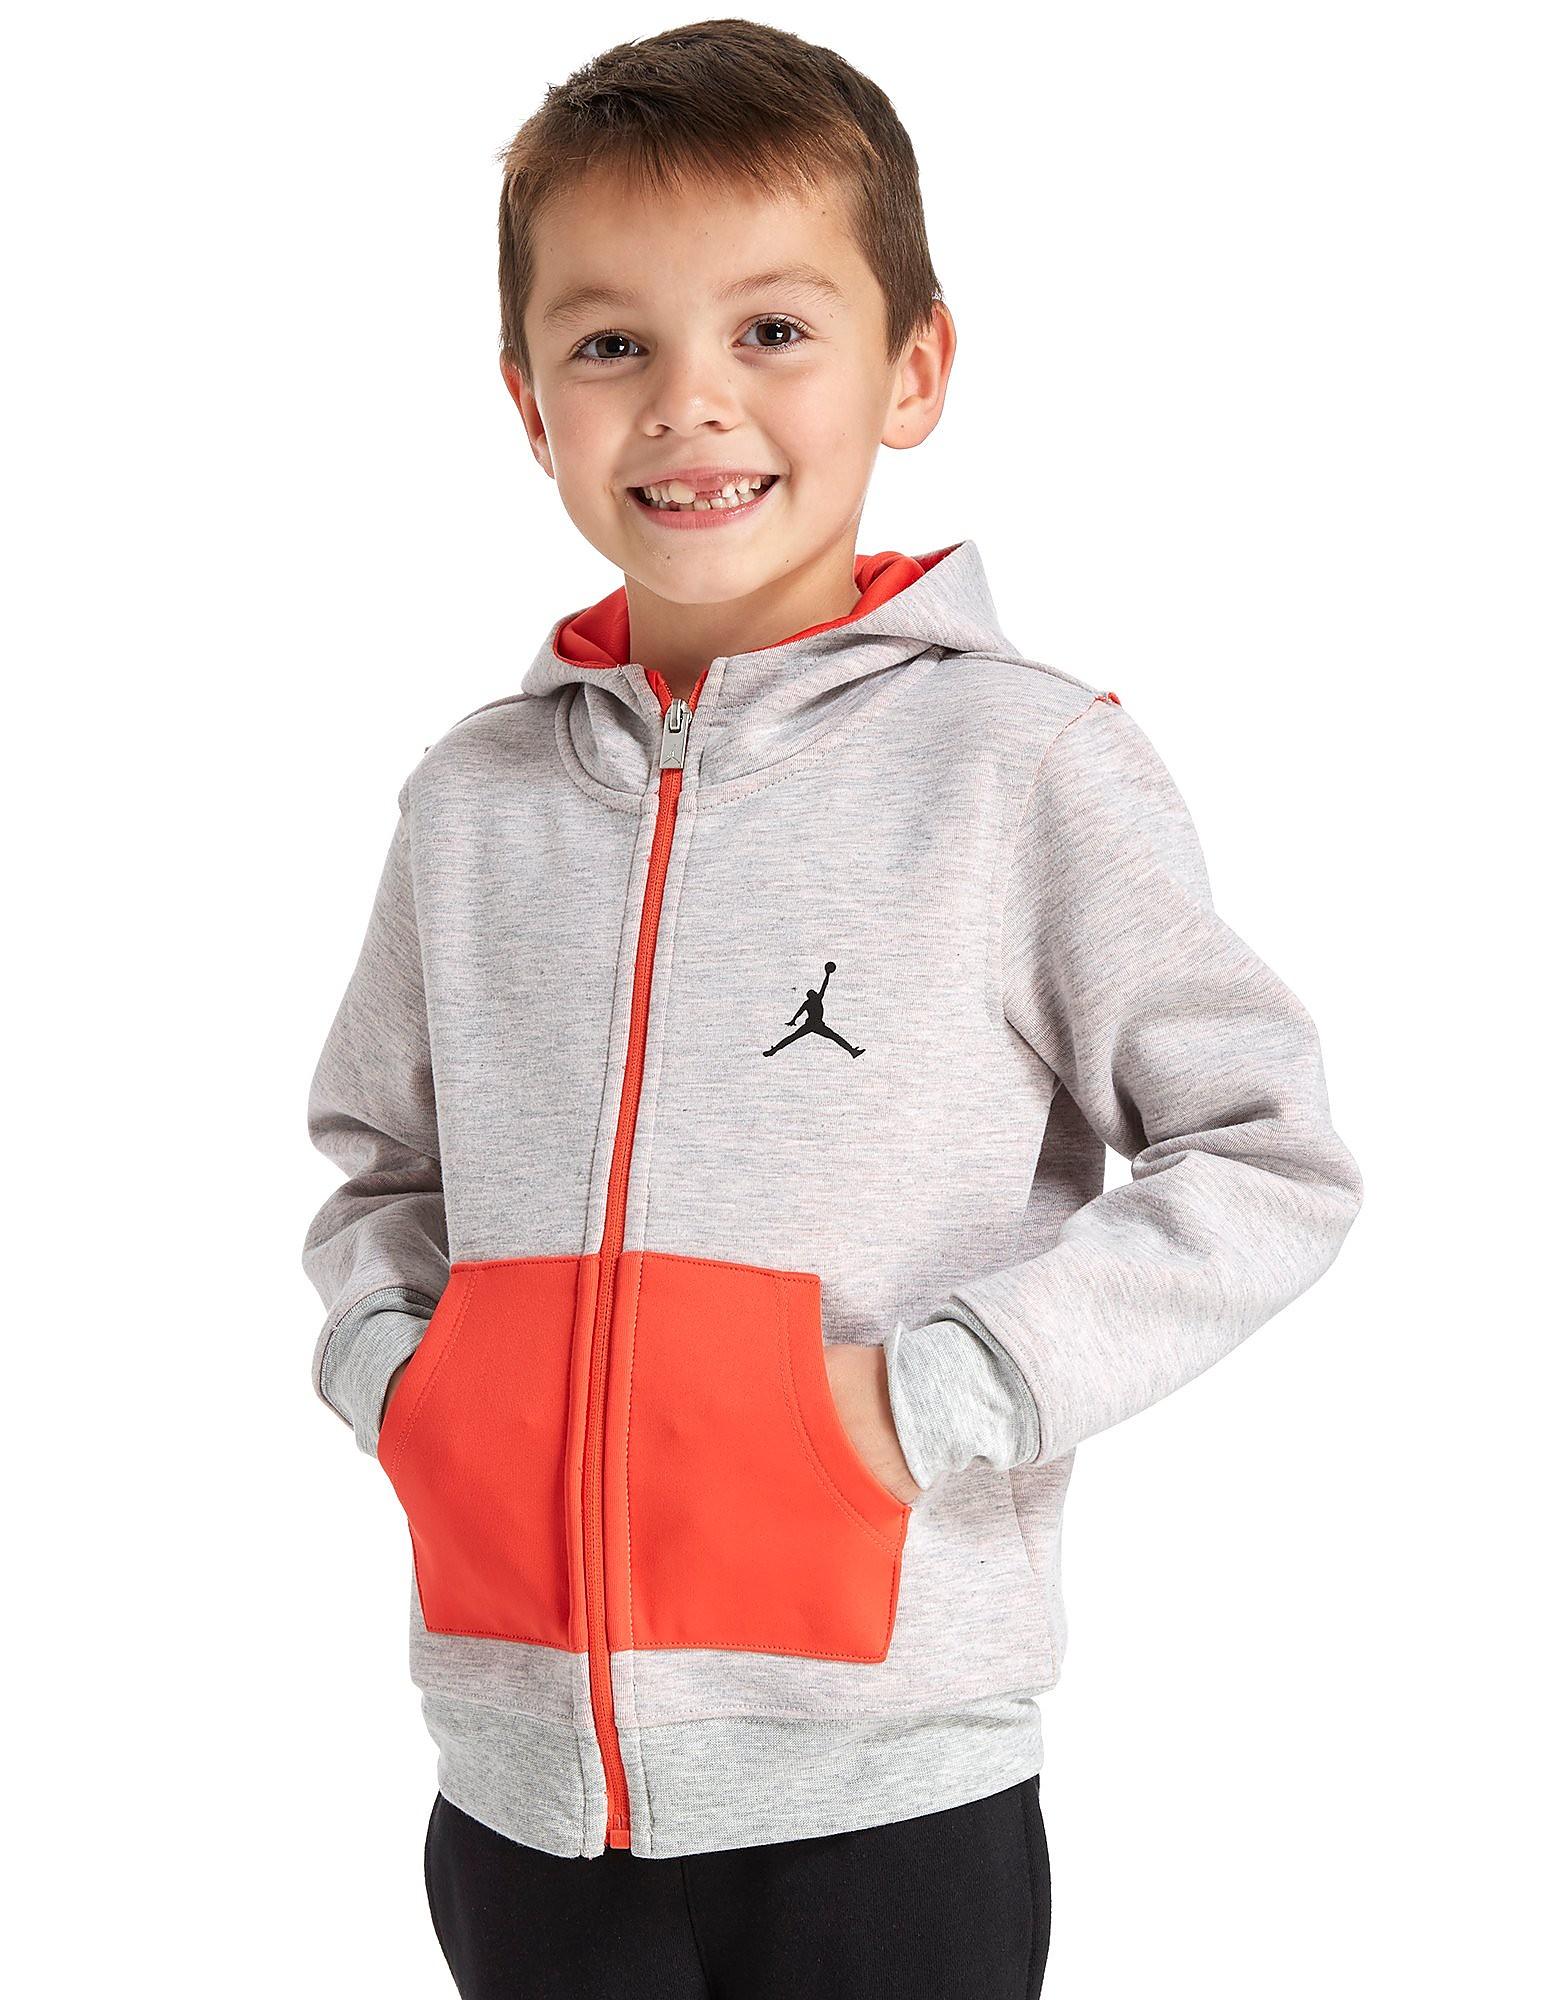 Jordan Jumpman Hoodie Children